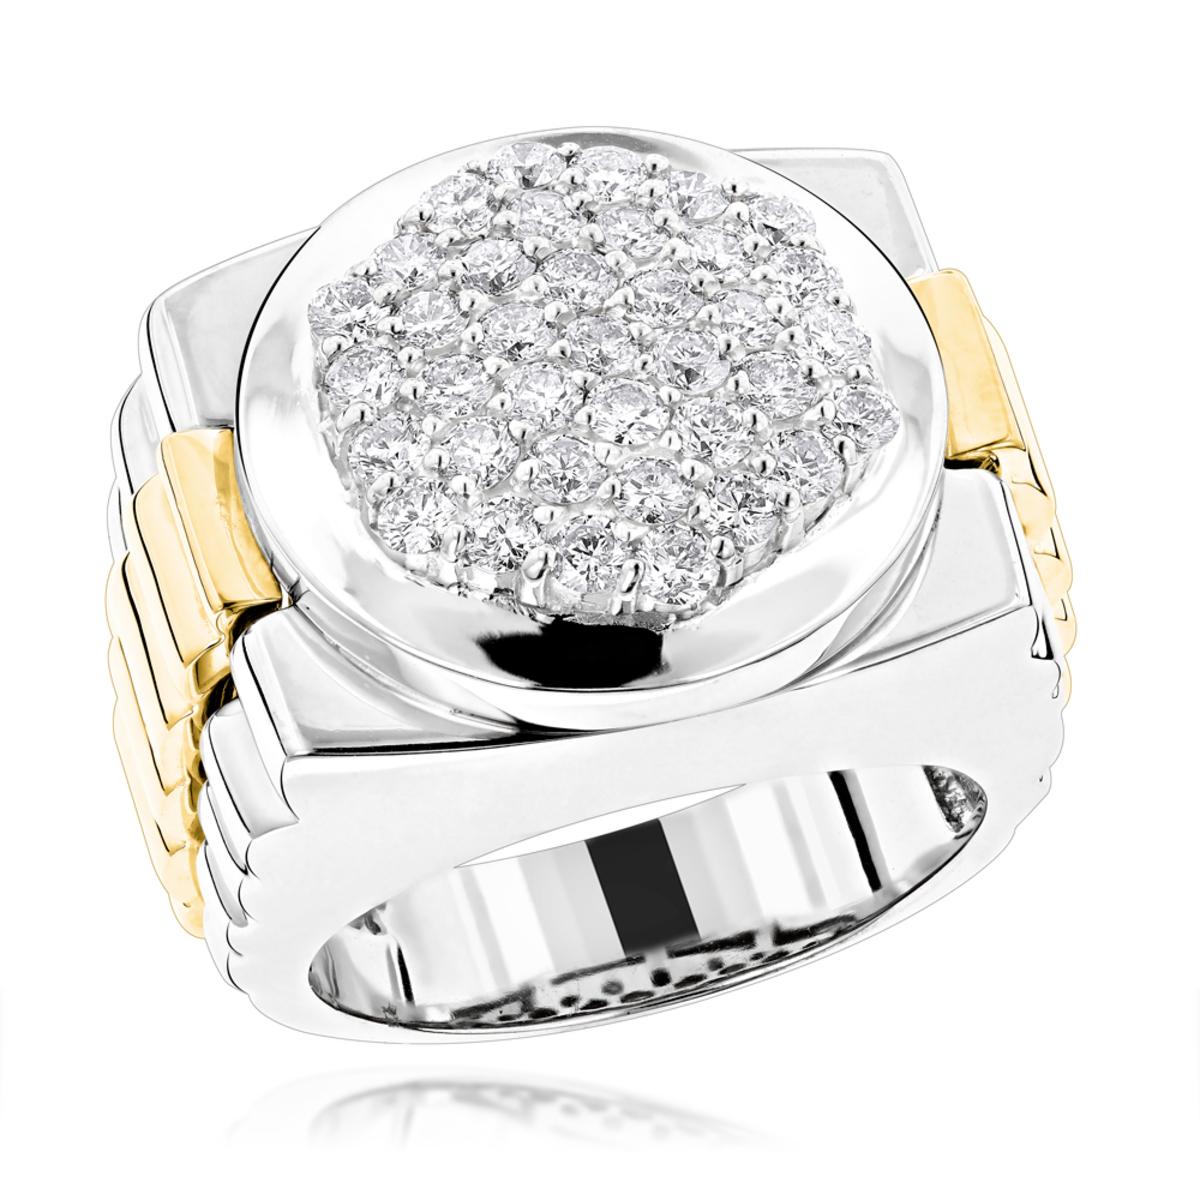 Mens 14K Two Tone Gold Diamond Ring with Pave Round Diamonds 2.04ct